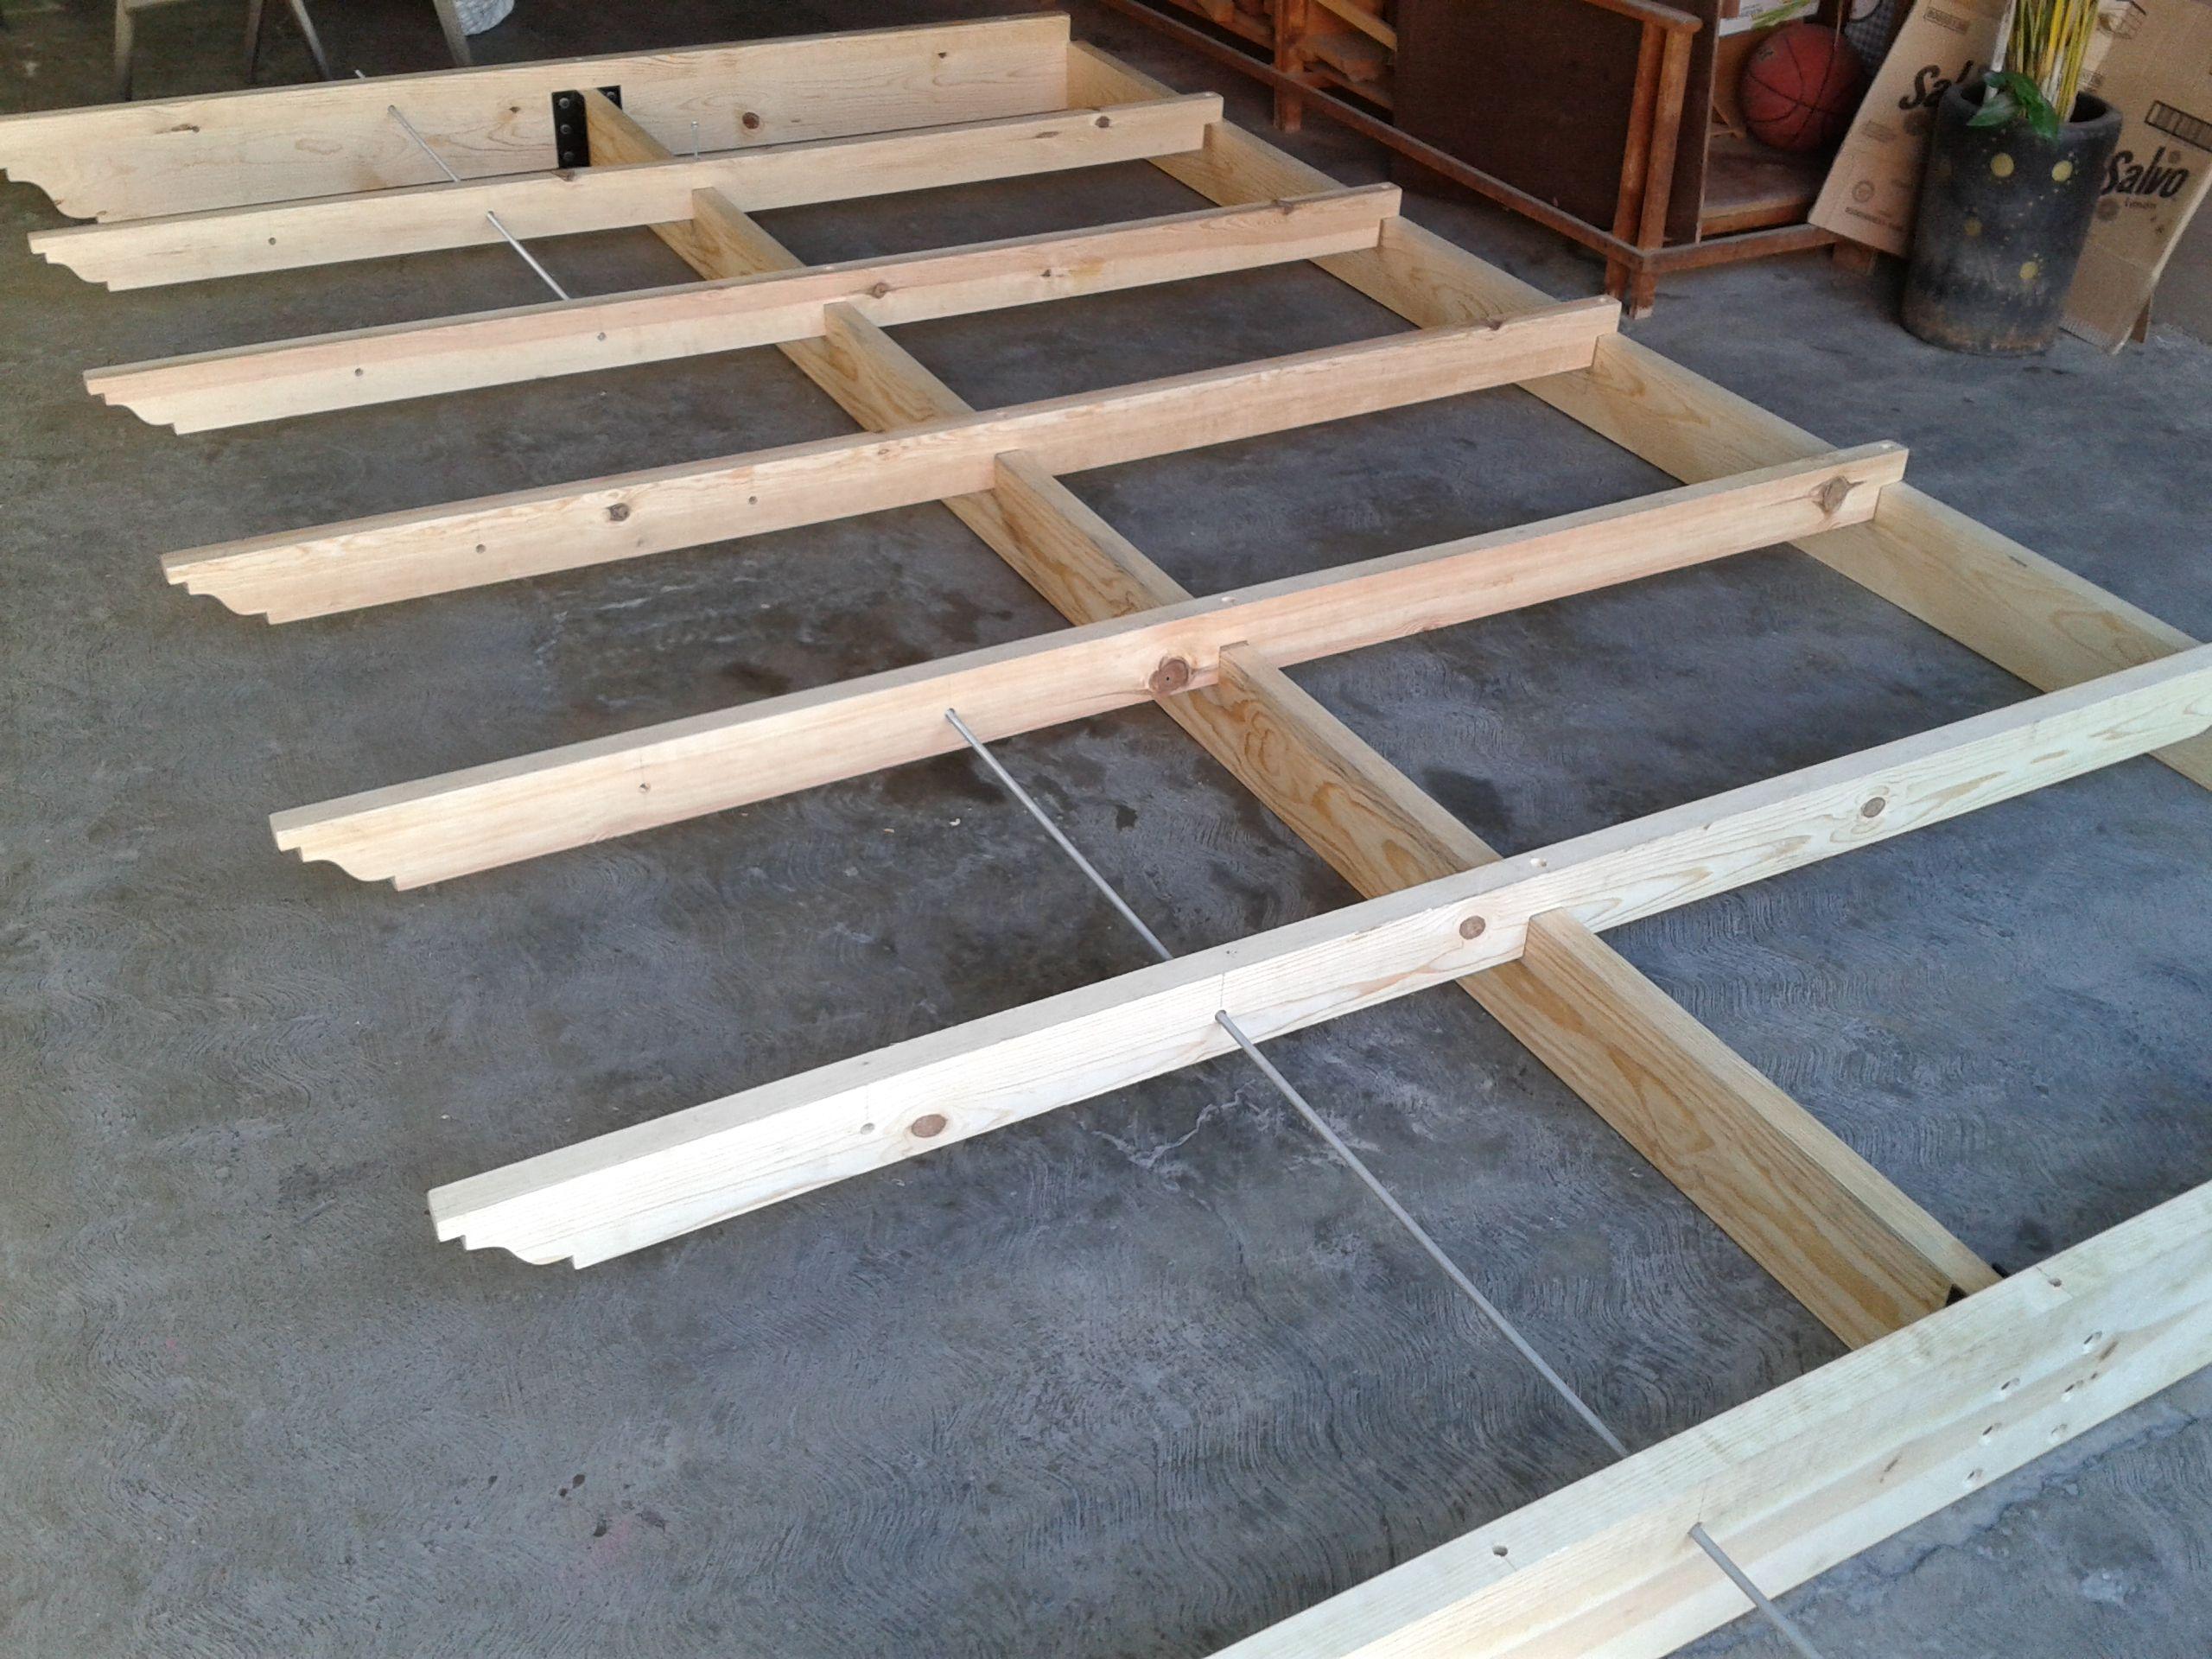 Proceso de construcci n de p rgola de madera con - Construccion de pergolas de madera ...